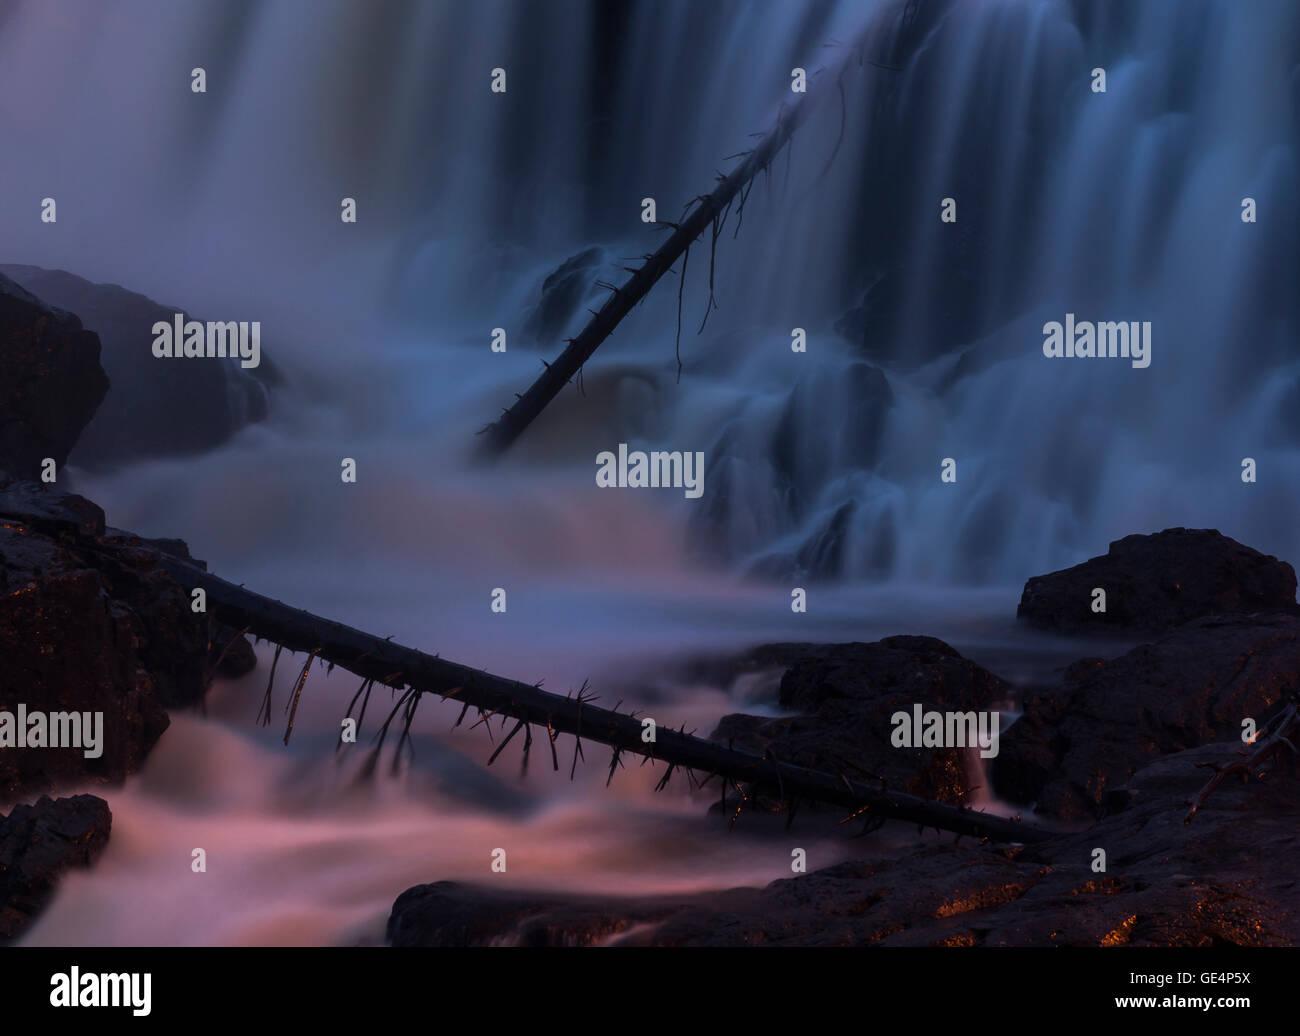 La Haugfossen, cascada, a Blaafarvevaerket en Åmot, Modum, Noruega. Toma por la noche. Foto de stock